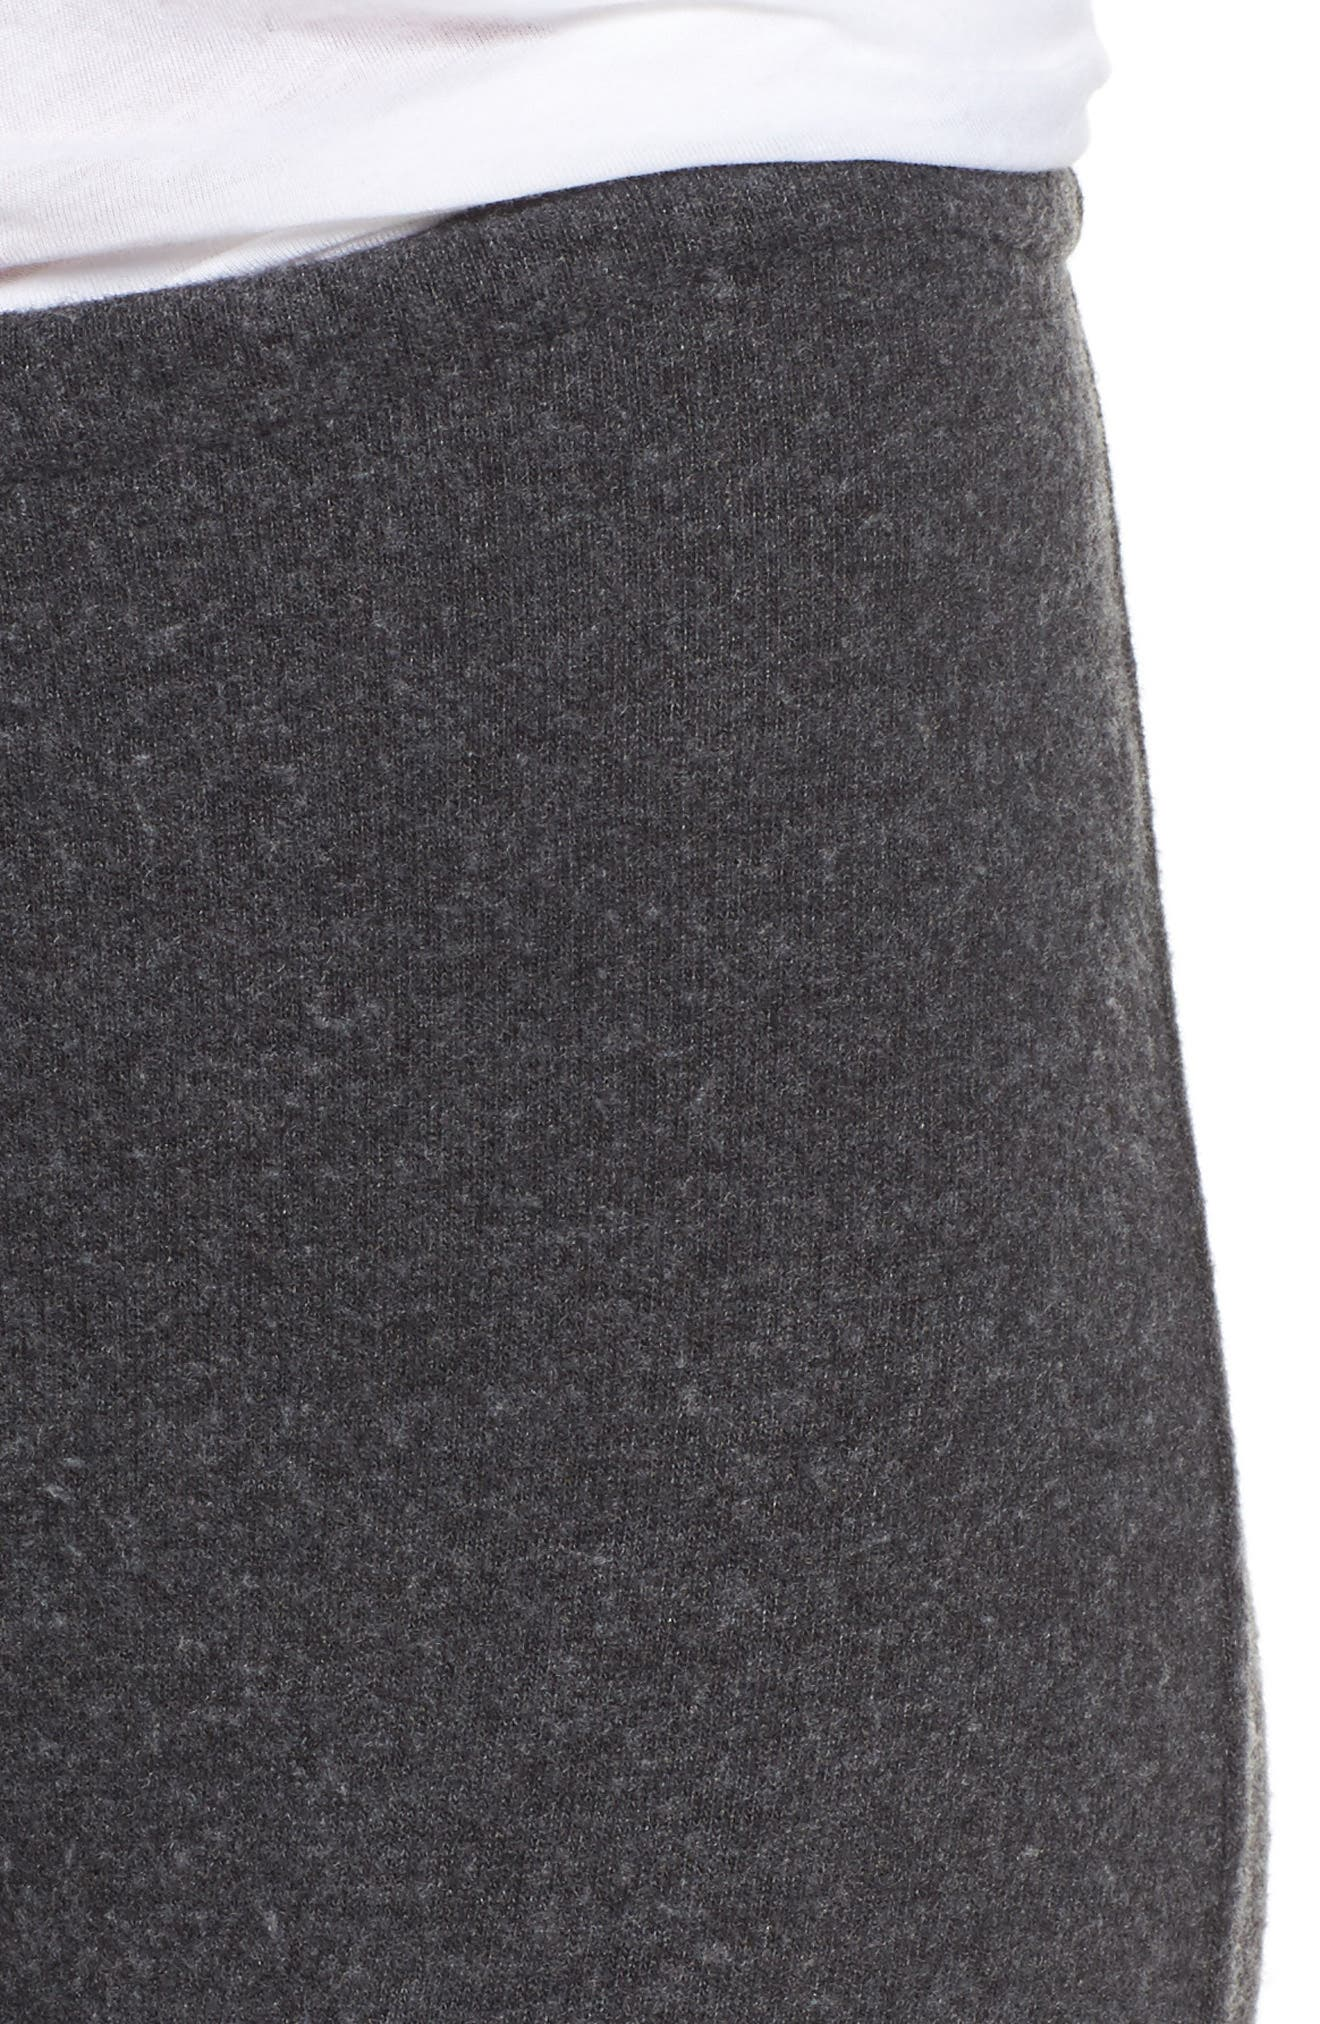 Love Lounge Jogger Pants,                             Alternate thumbnail 6, color,                             Black